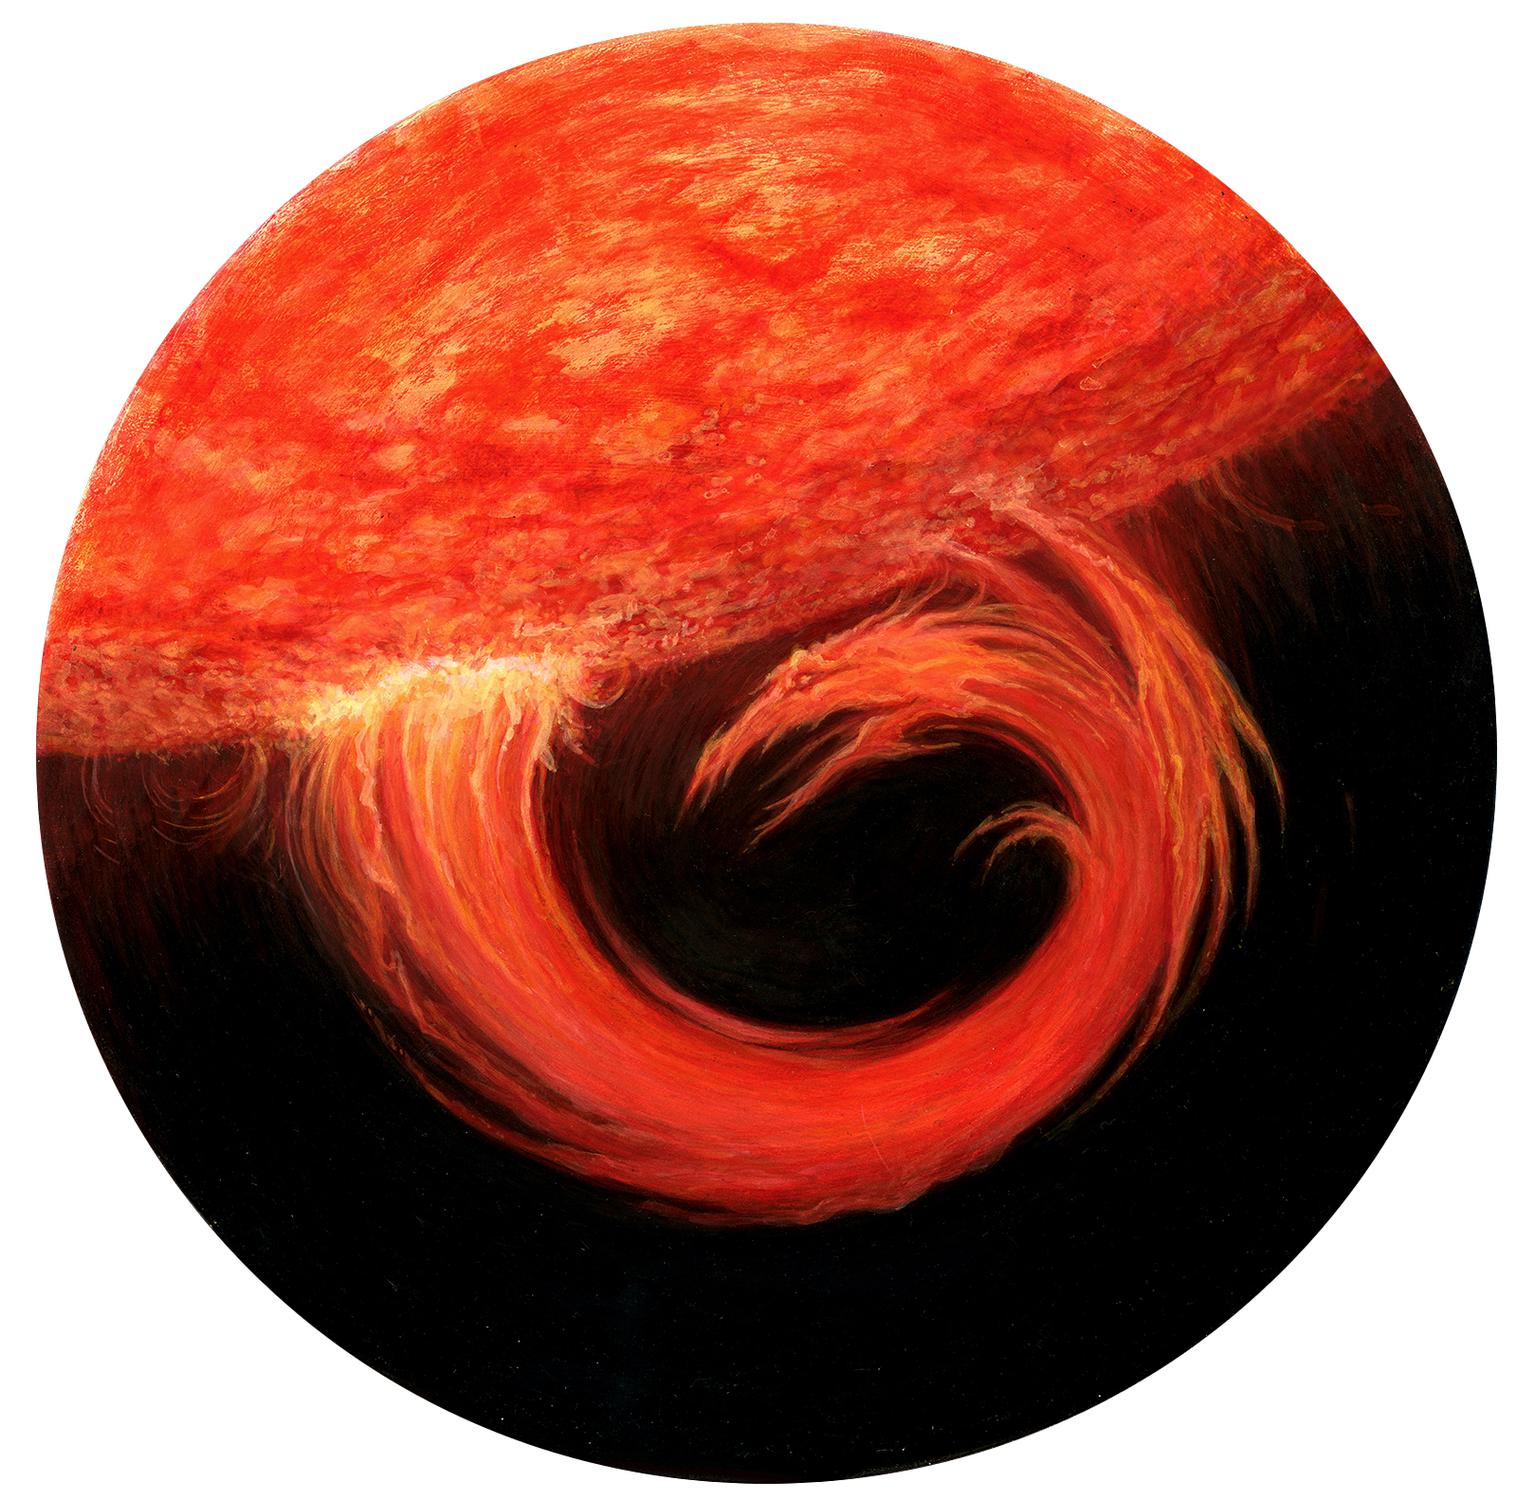 Solar Flare Dragon Artwork by I. S. Kallick